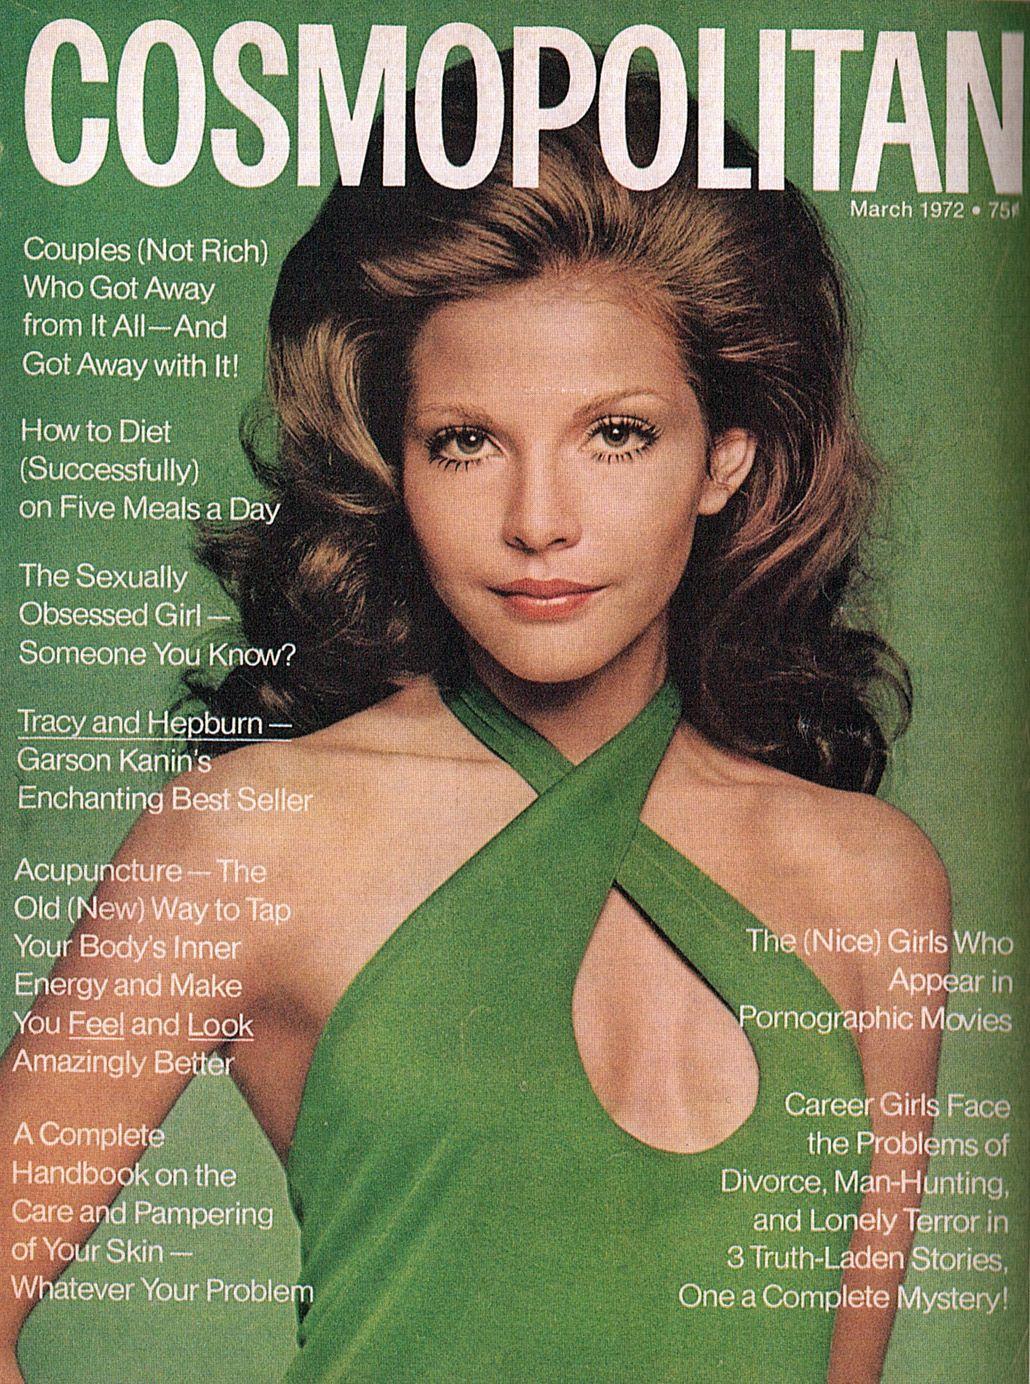 #Vintage #Cosmopolitan #MagazineCover #Halston